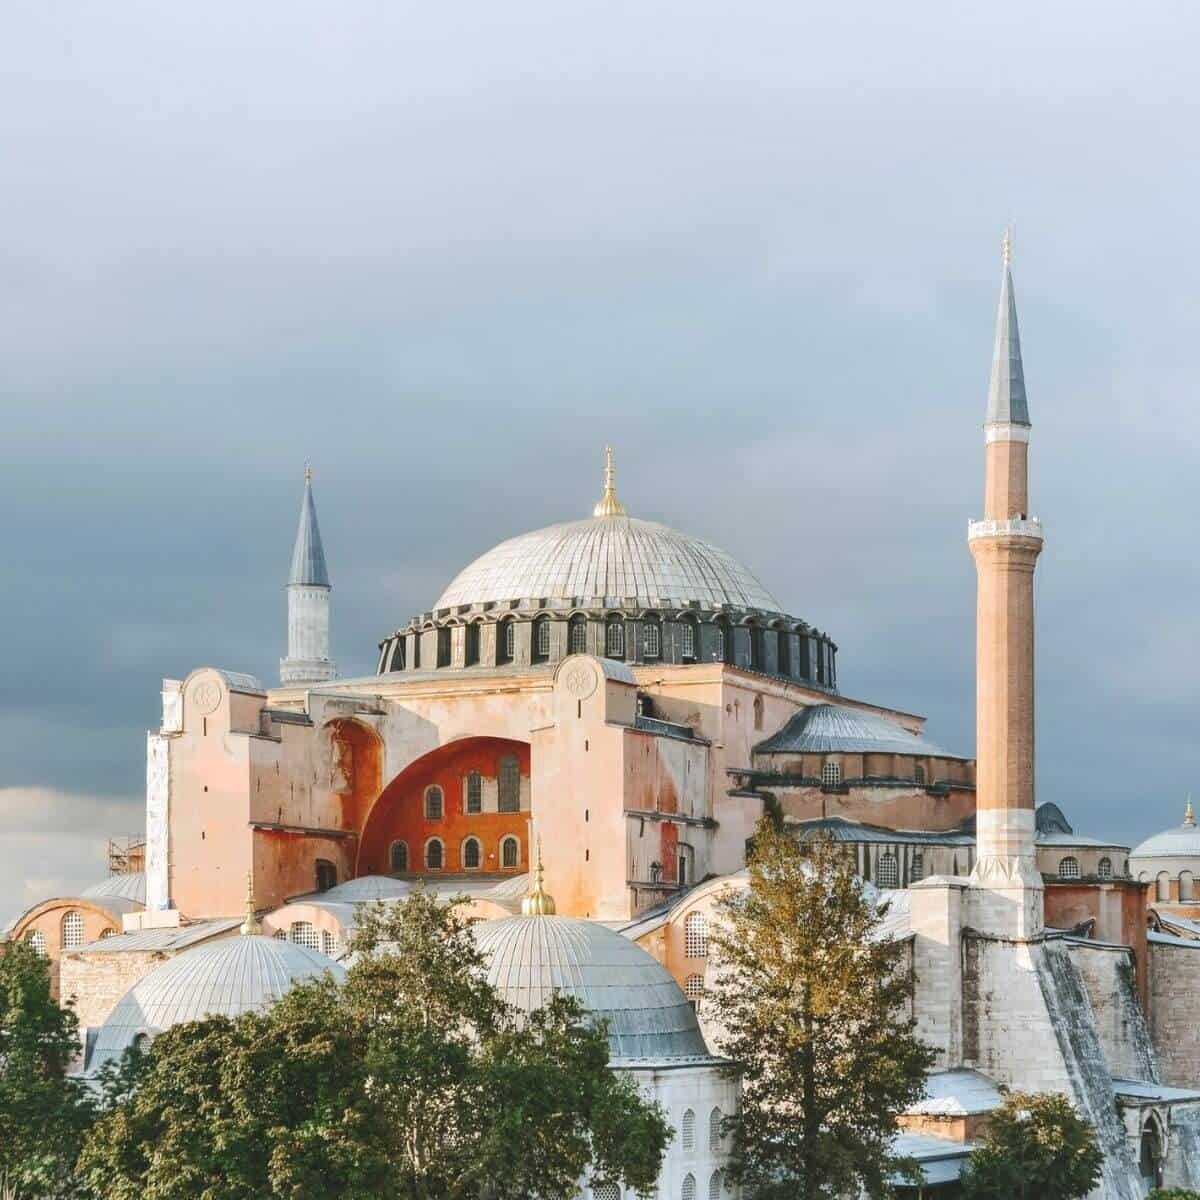 Hagia Sophia on a cloudy day.